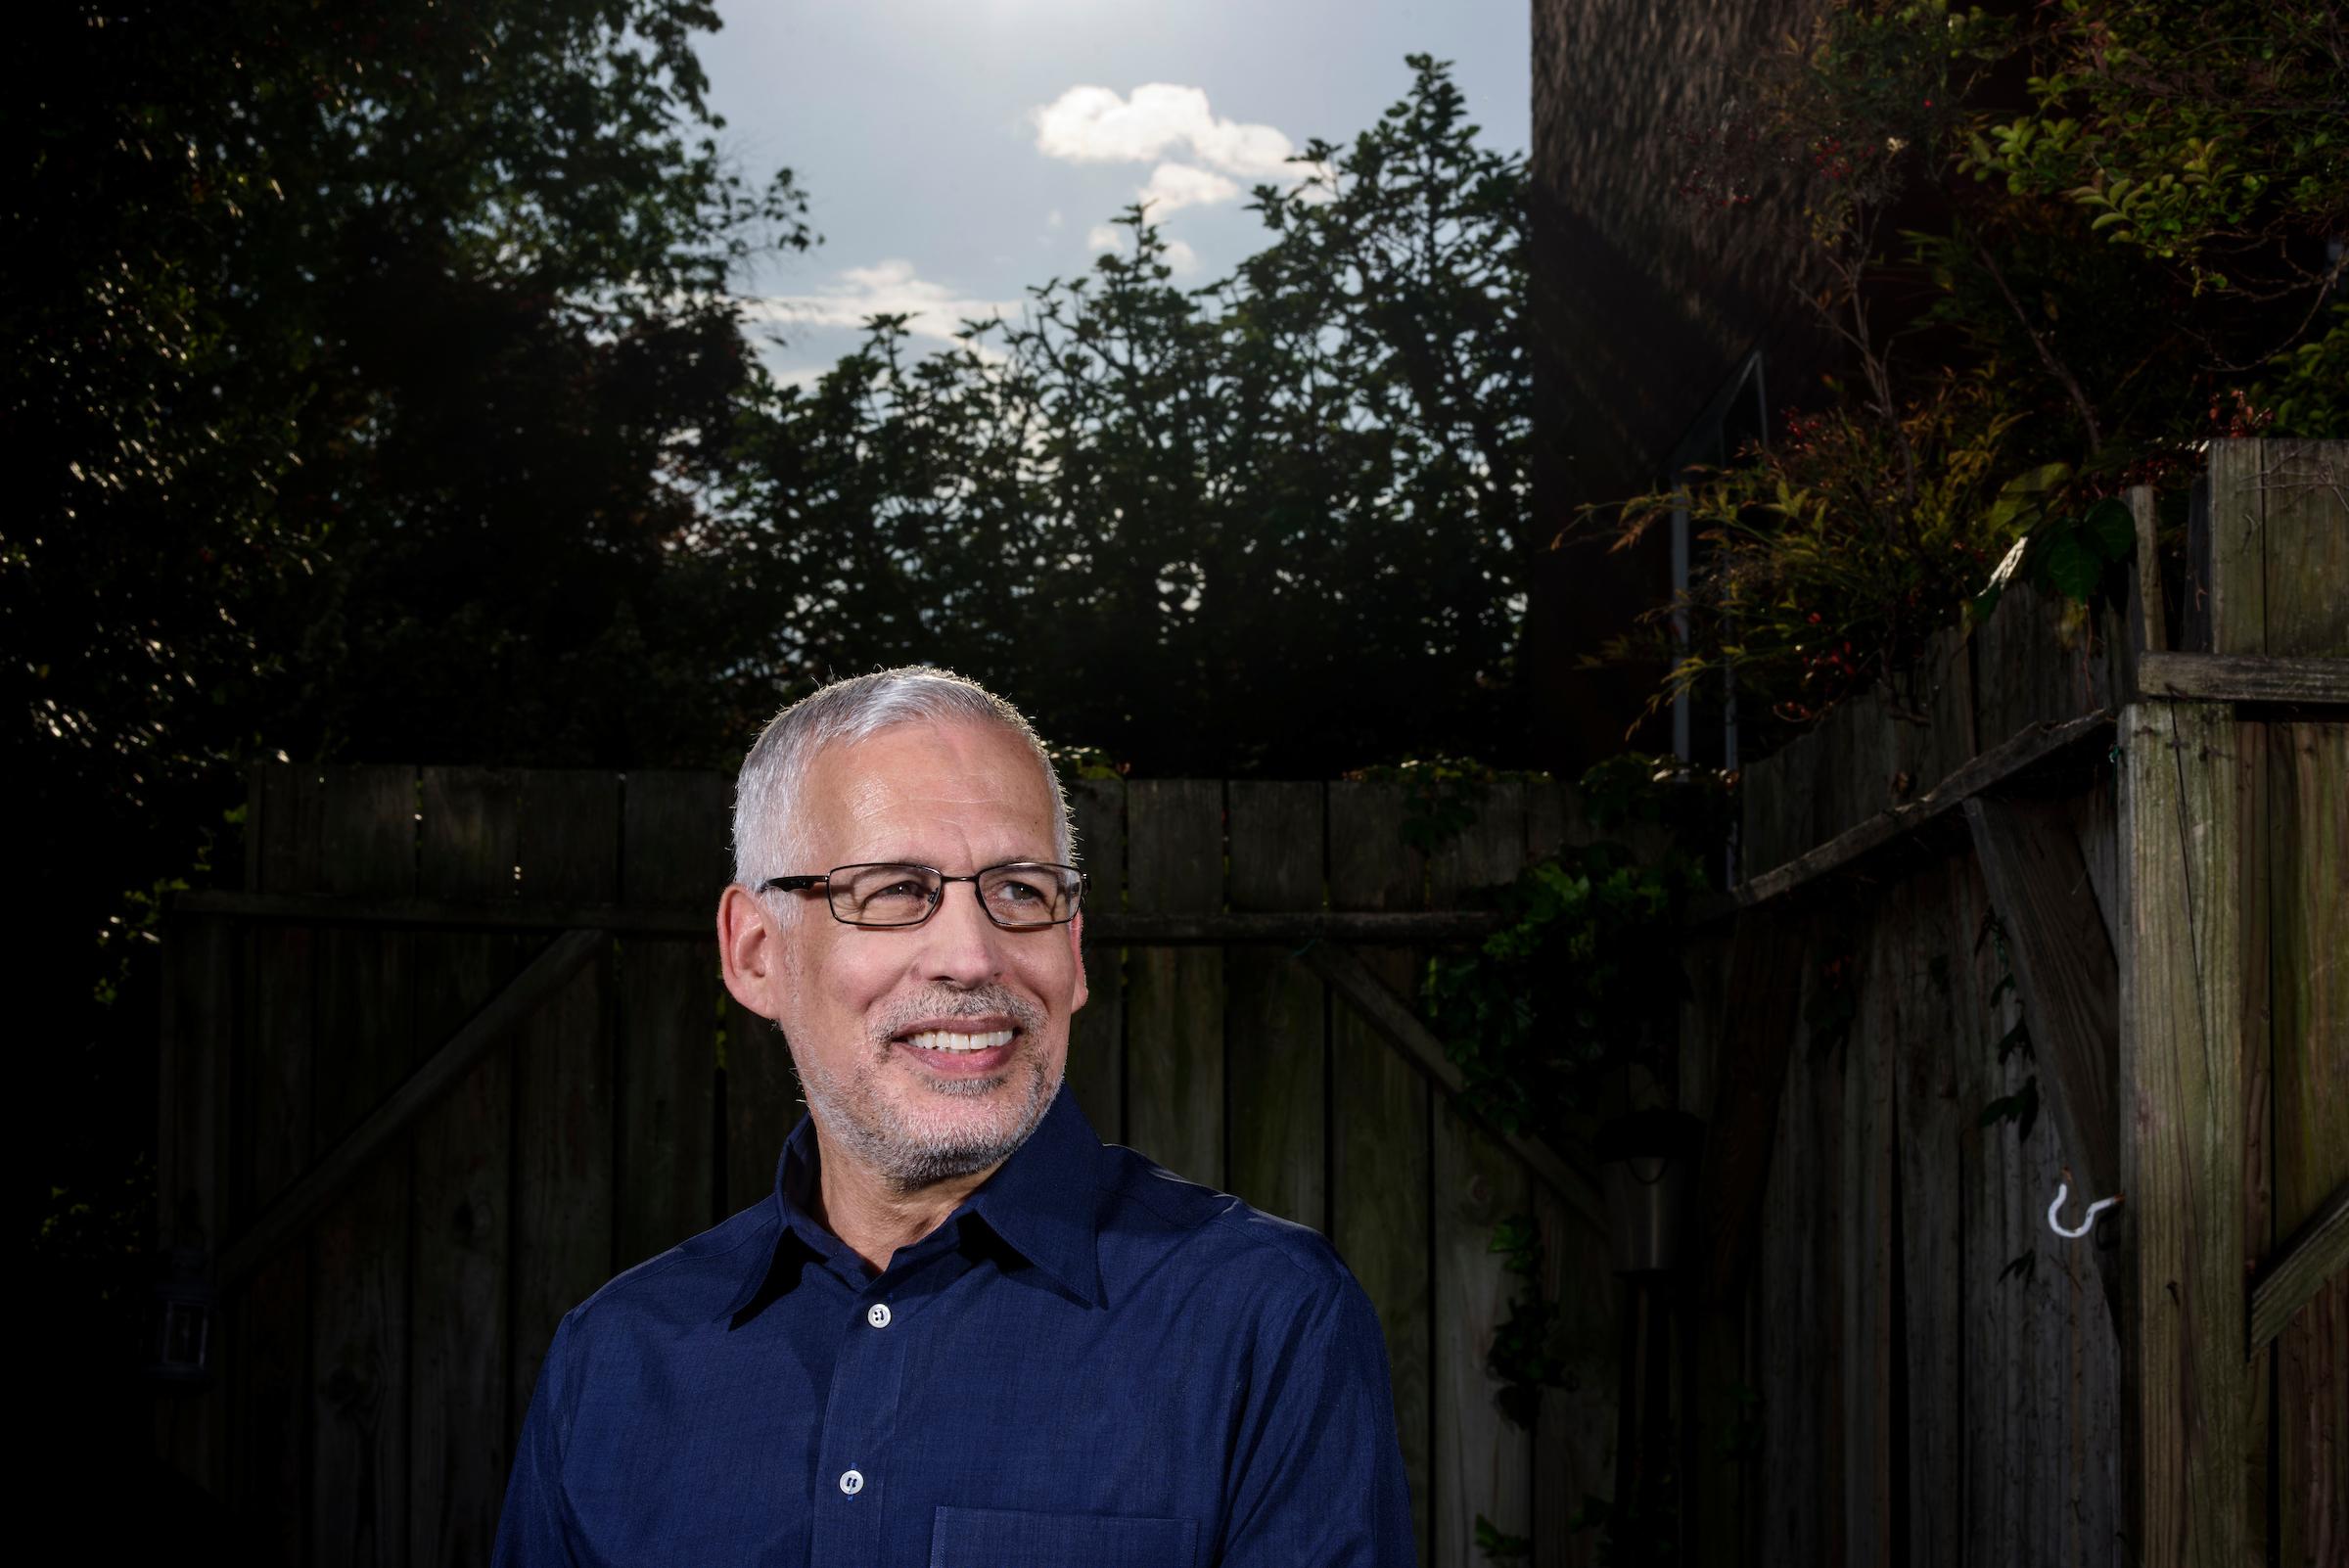 Washington, D.C. - April 21, 2017: David Guggenheim is a Marine Scientist, president and founder of Washington D.C. non-profit Ocean Doctor. CREDIT: Matt Roth